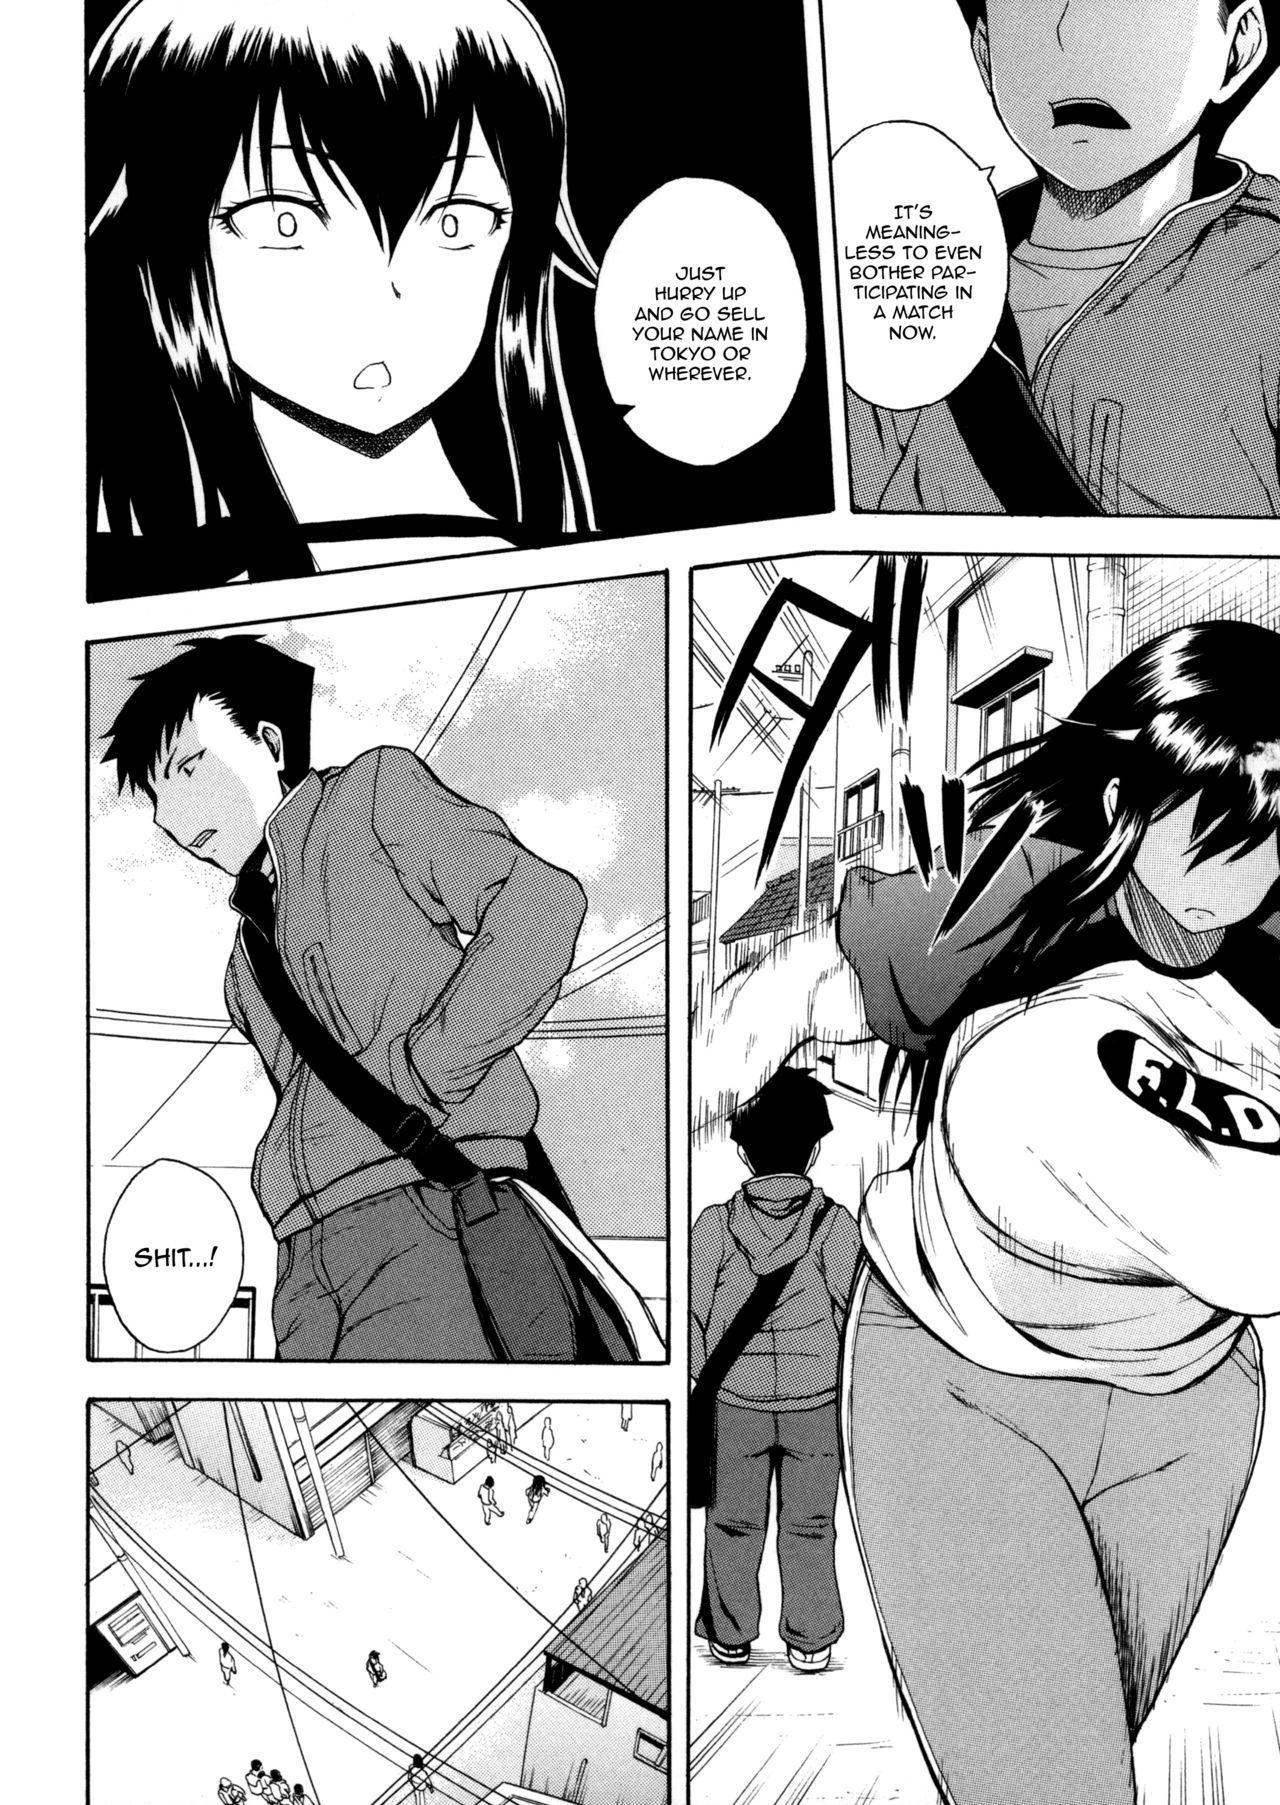 [Yoshimura Tatsumaki] Monzetsu Taigatame ~Count 3 de Ikasete Ageru~ | Faint in Agony Bodylock ~I'll make you cum on the count of 3~ [English] [Brolen] 154